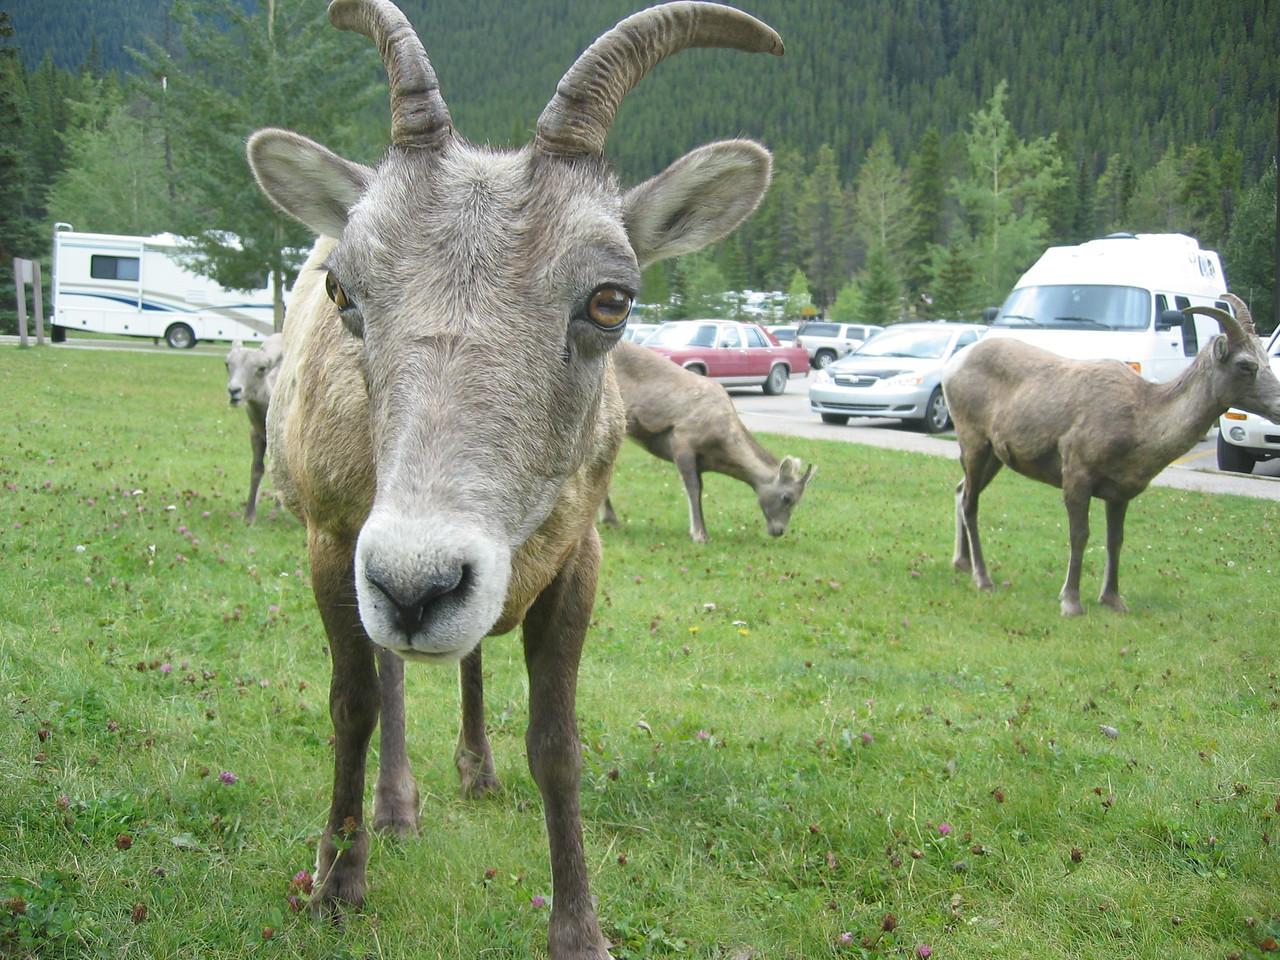 A Jasper goat